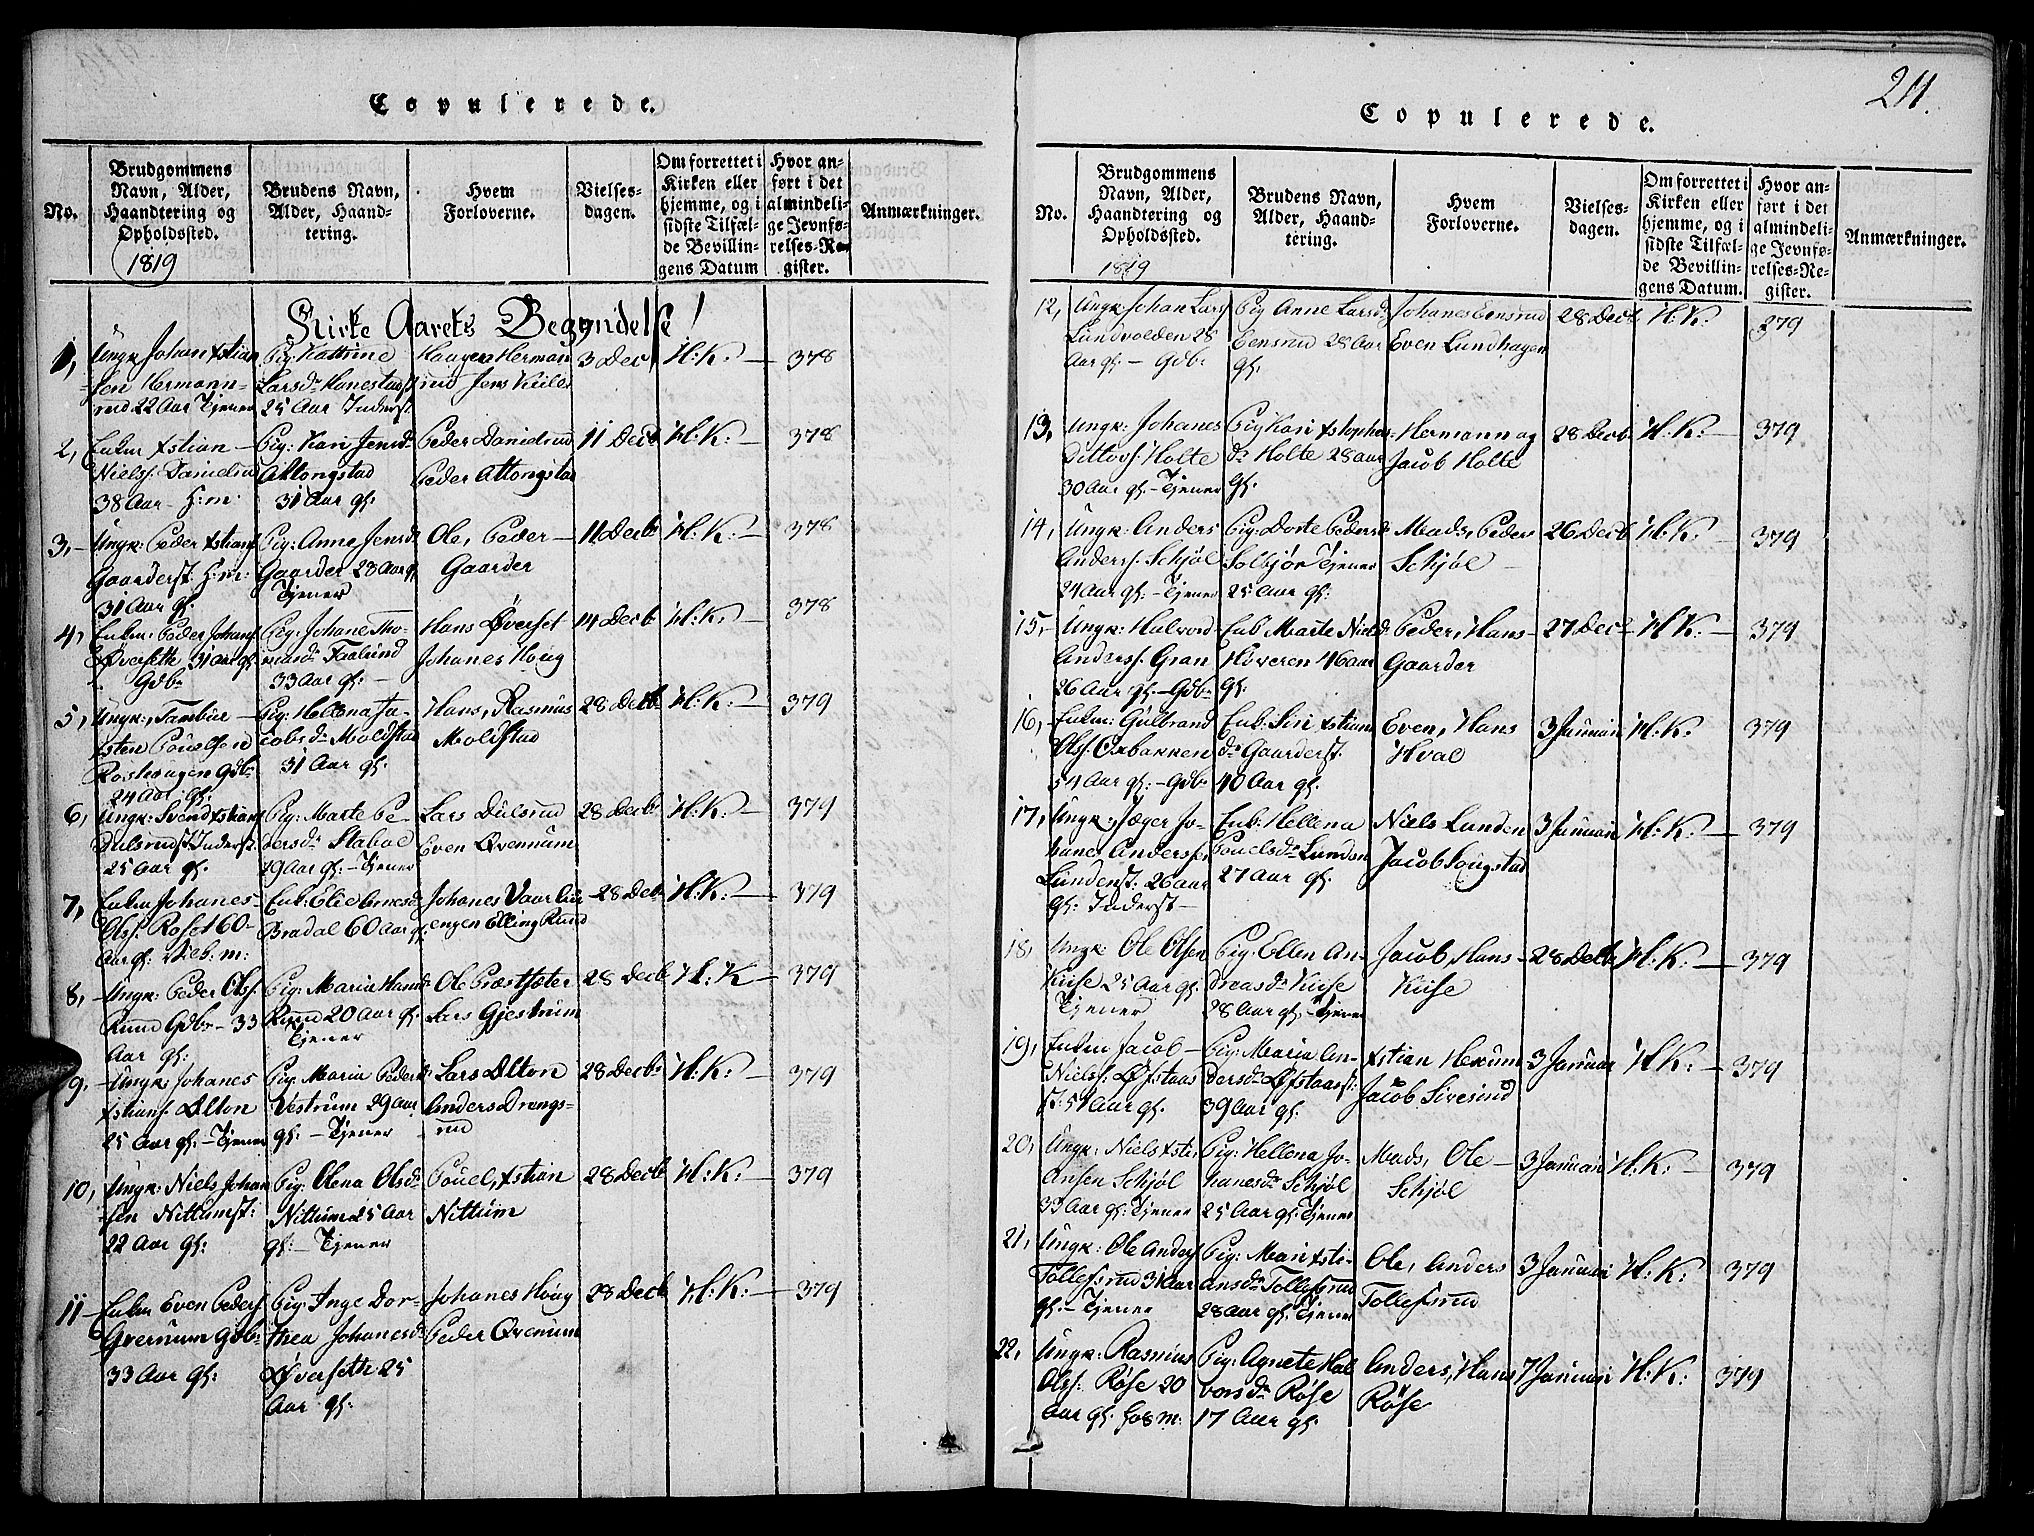 SAH, Toten prestekontor, Ministerialbok nr. 9, 1814-1820, s. 211